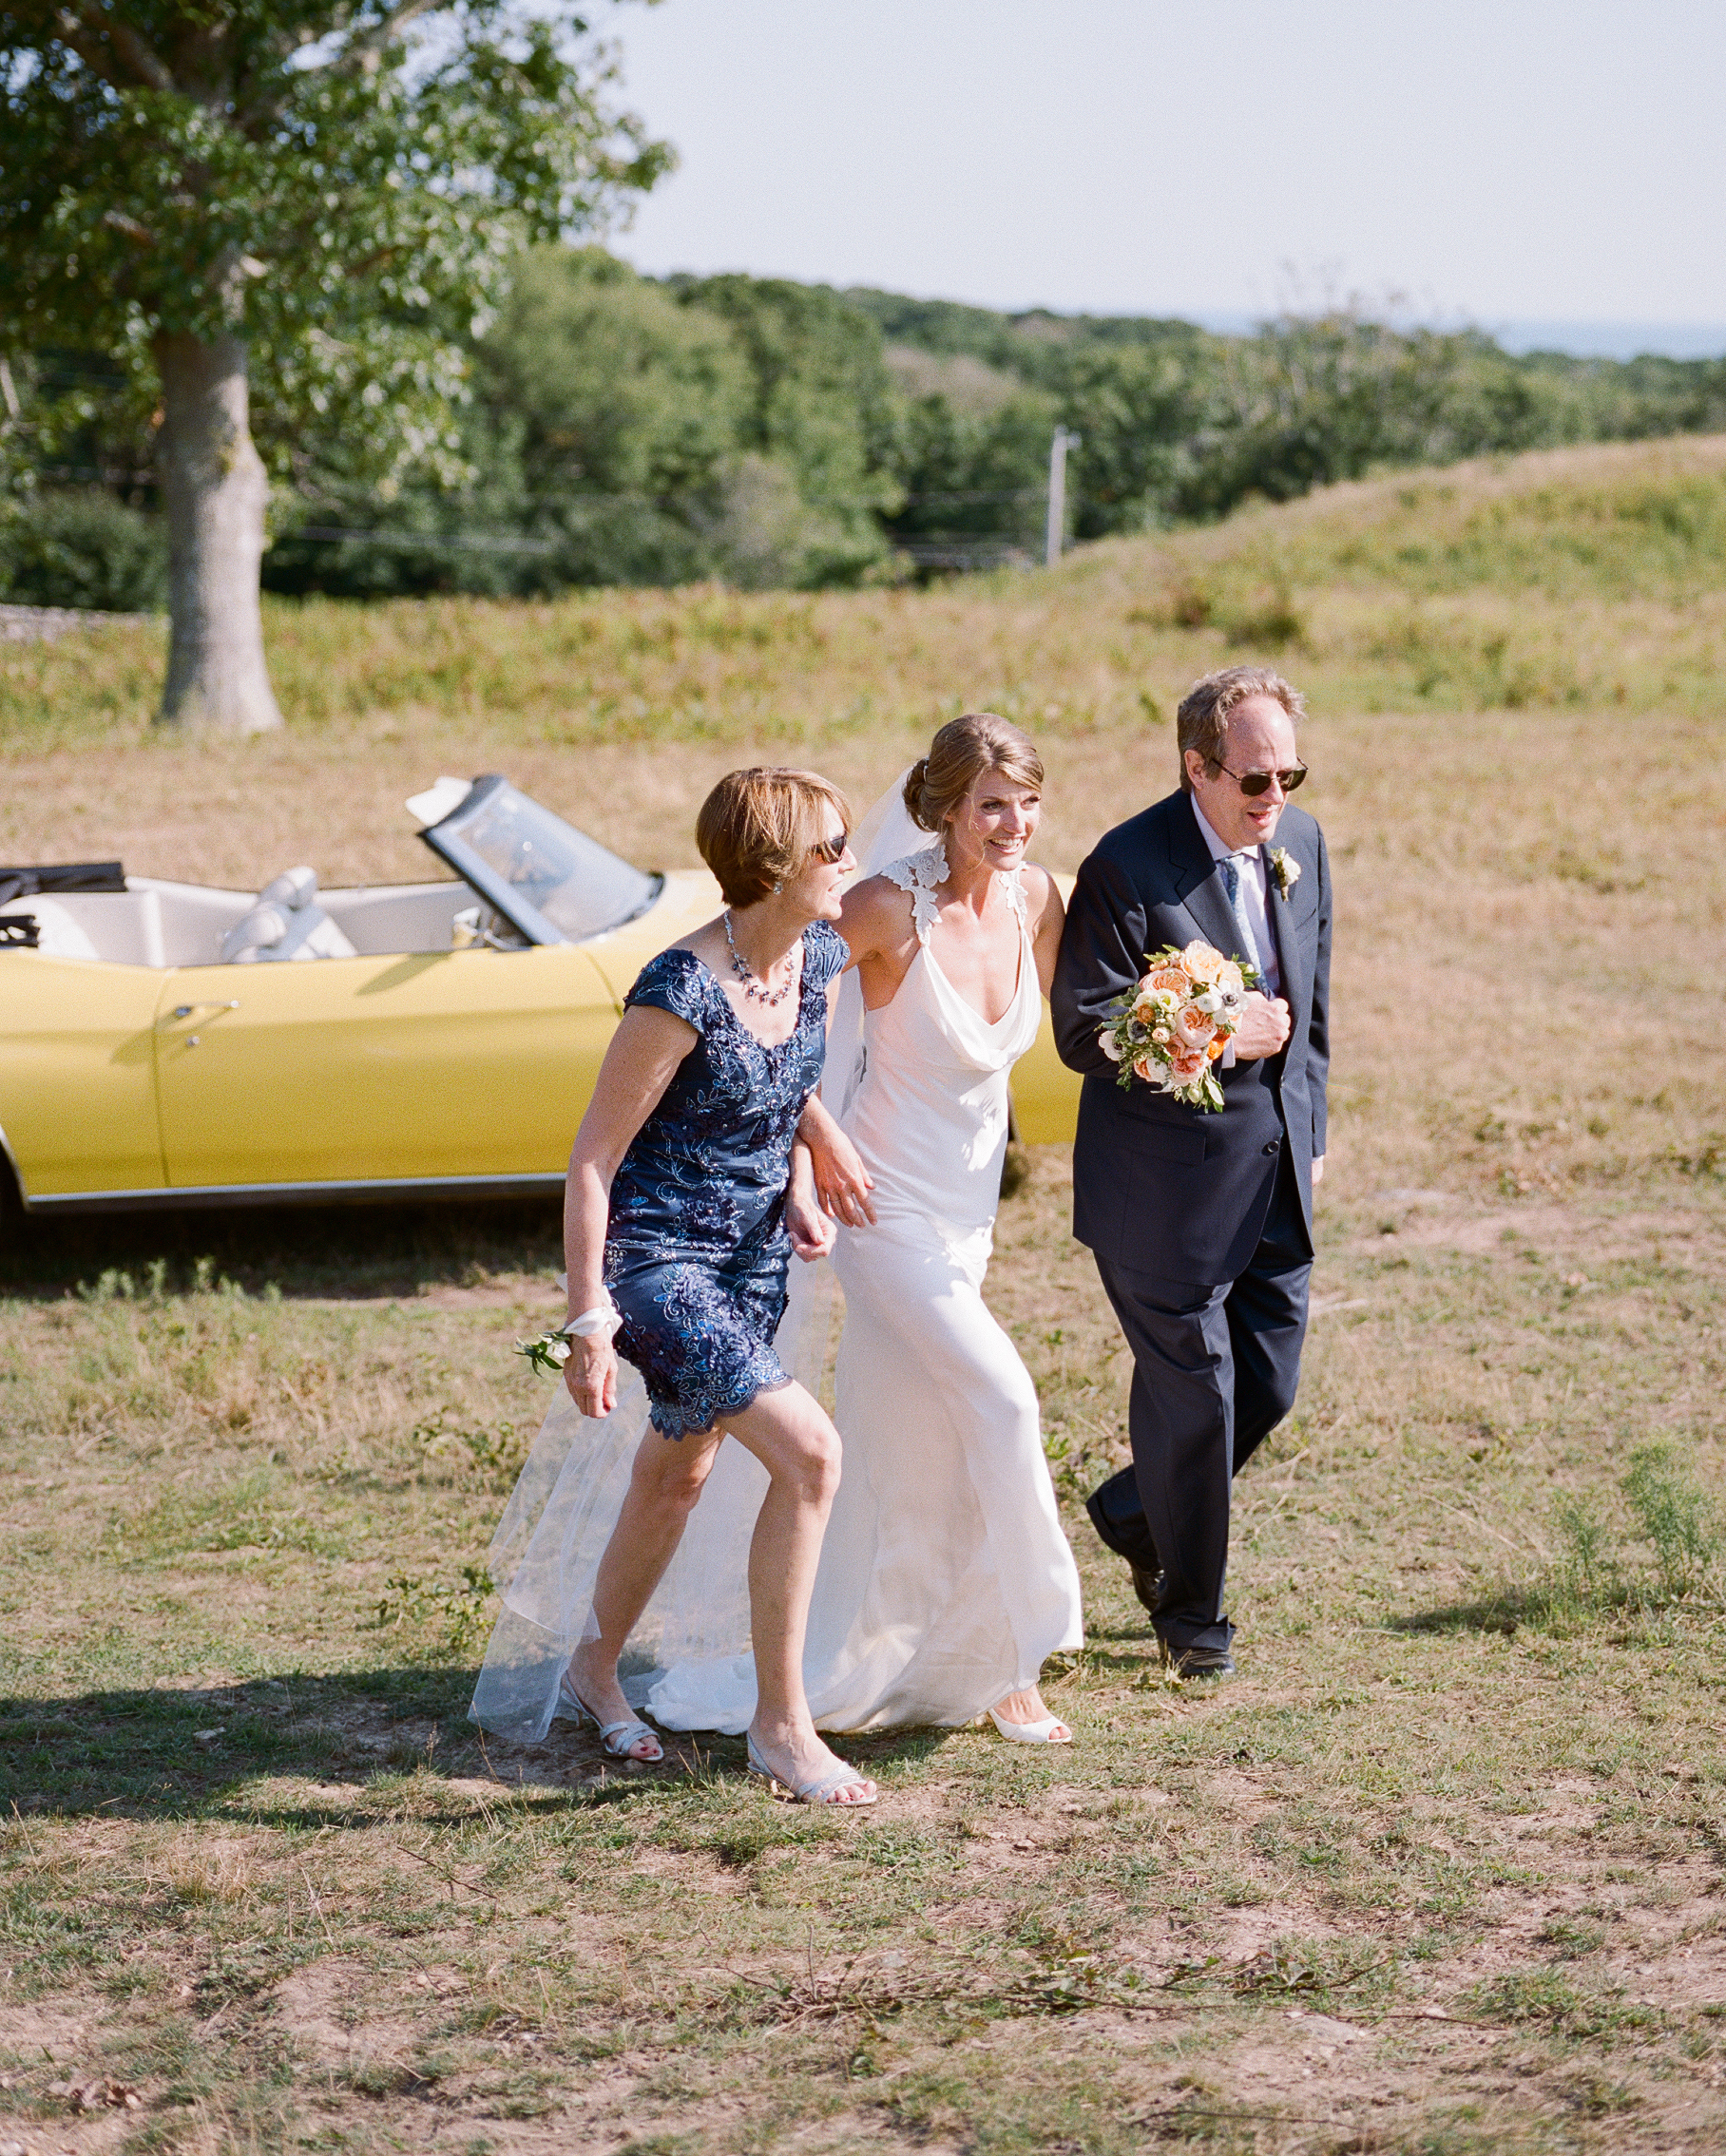 jocelyn-graham-wedding-processional-0738-s111847-0315.jpg